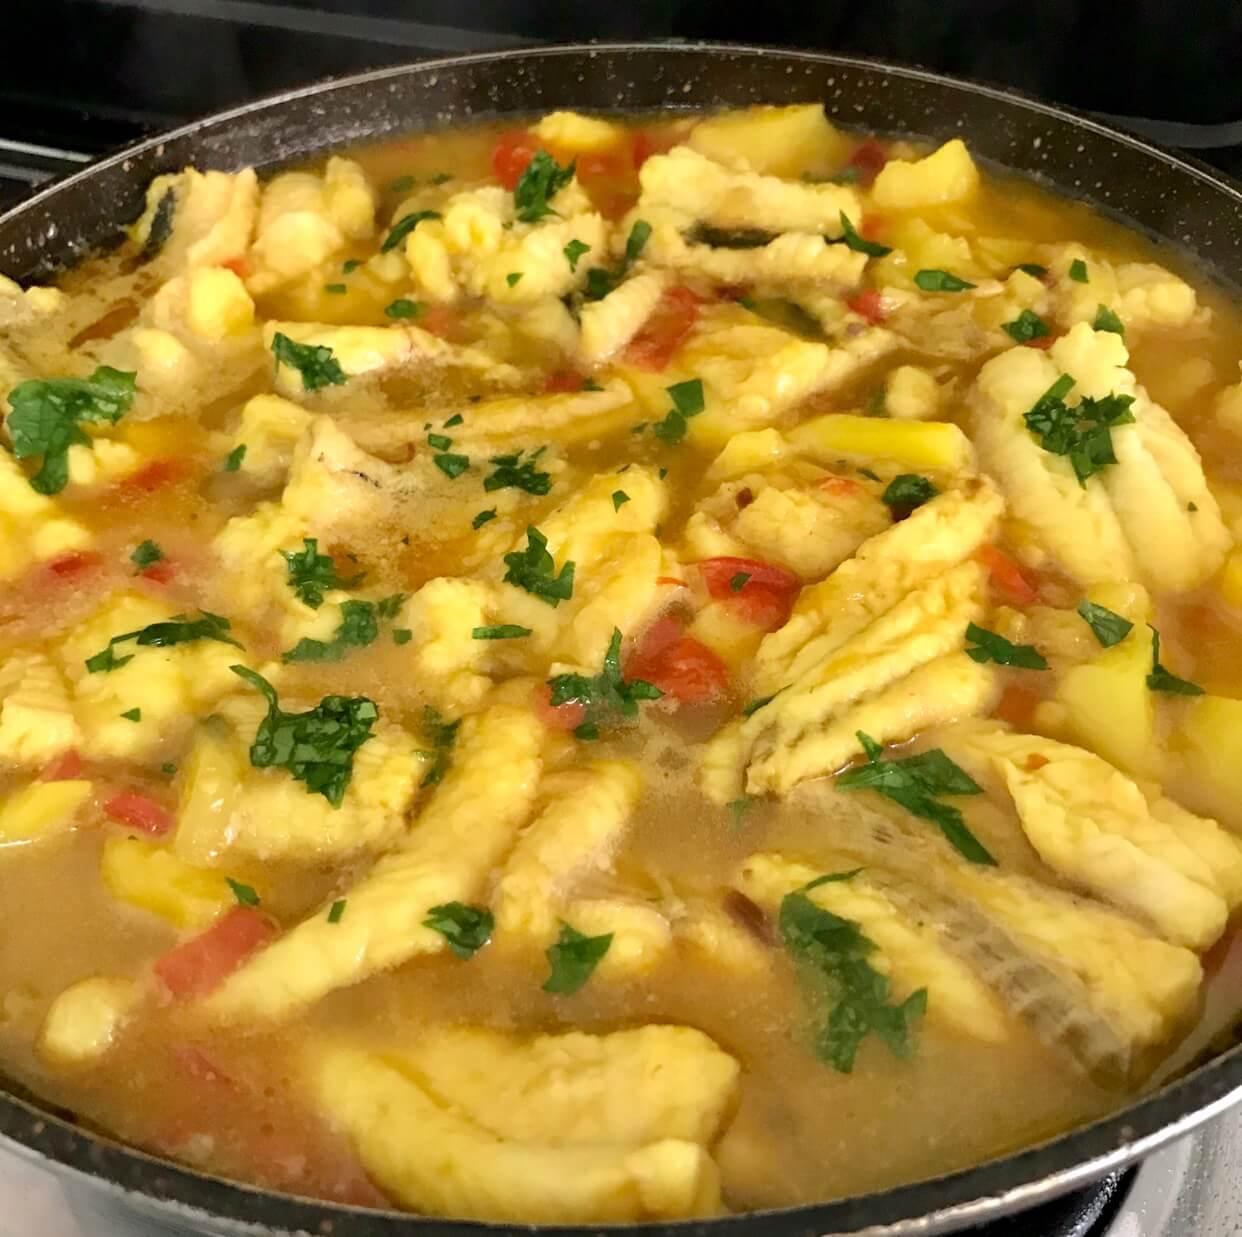 Golayo con patatas